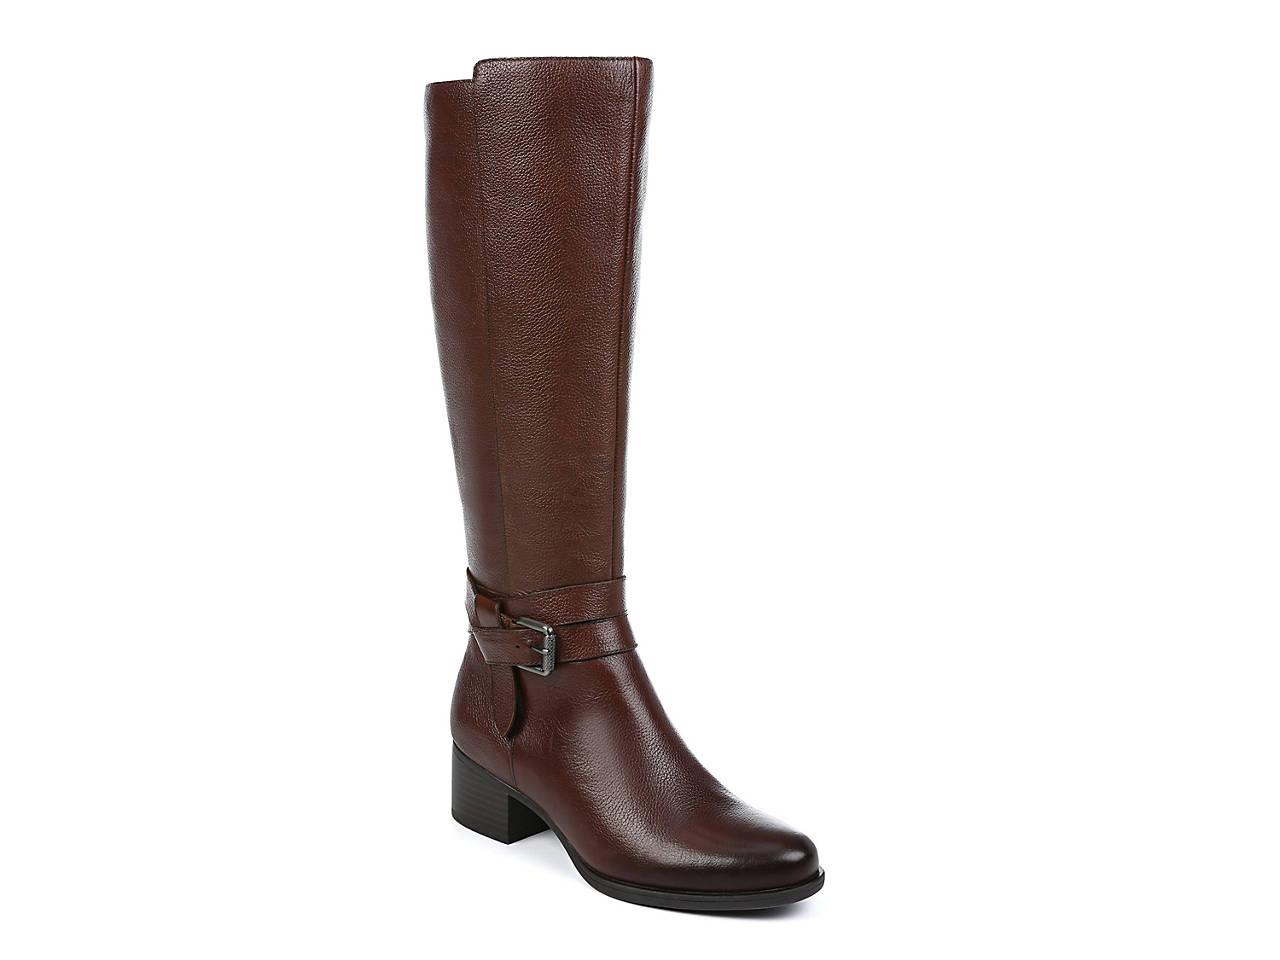 56257433e58 Naturalizer Kane Riding Boot Women s Shoes